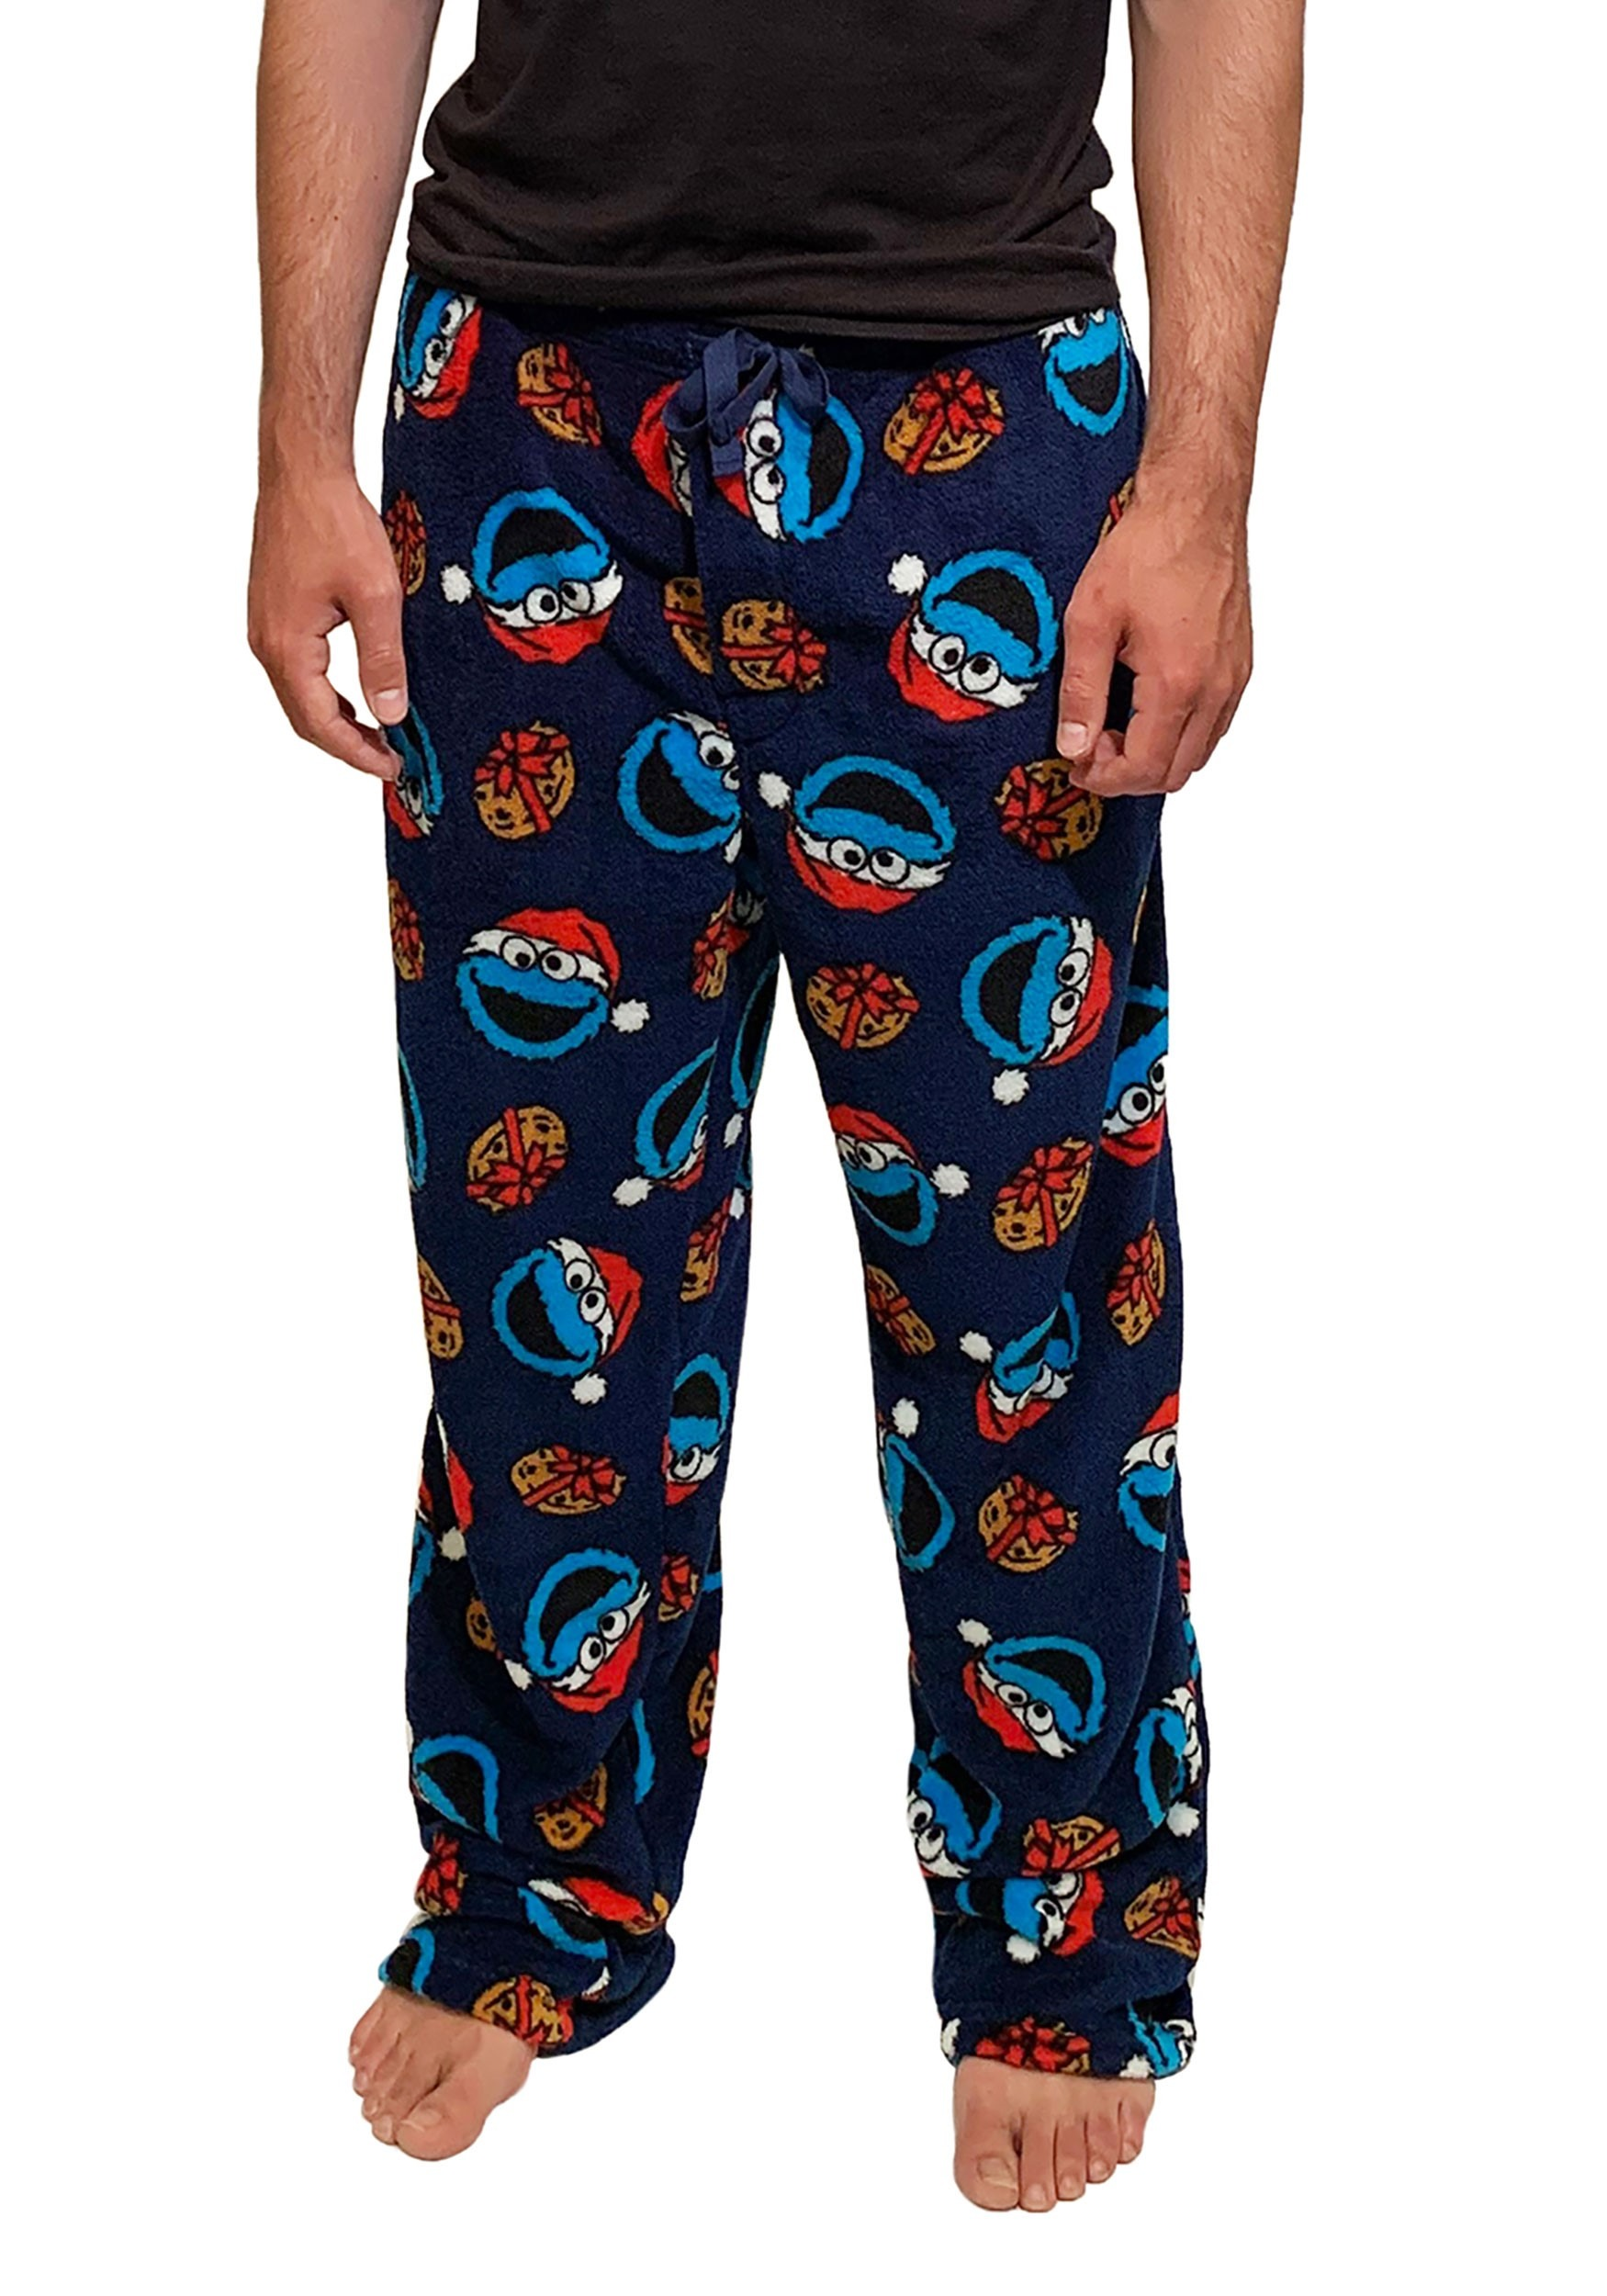 Santa Cookie Monster Men's Soft Lounge Pants